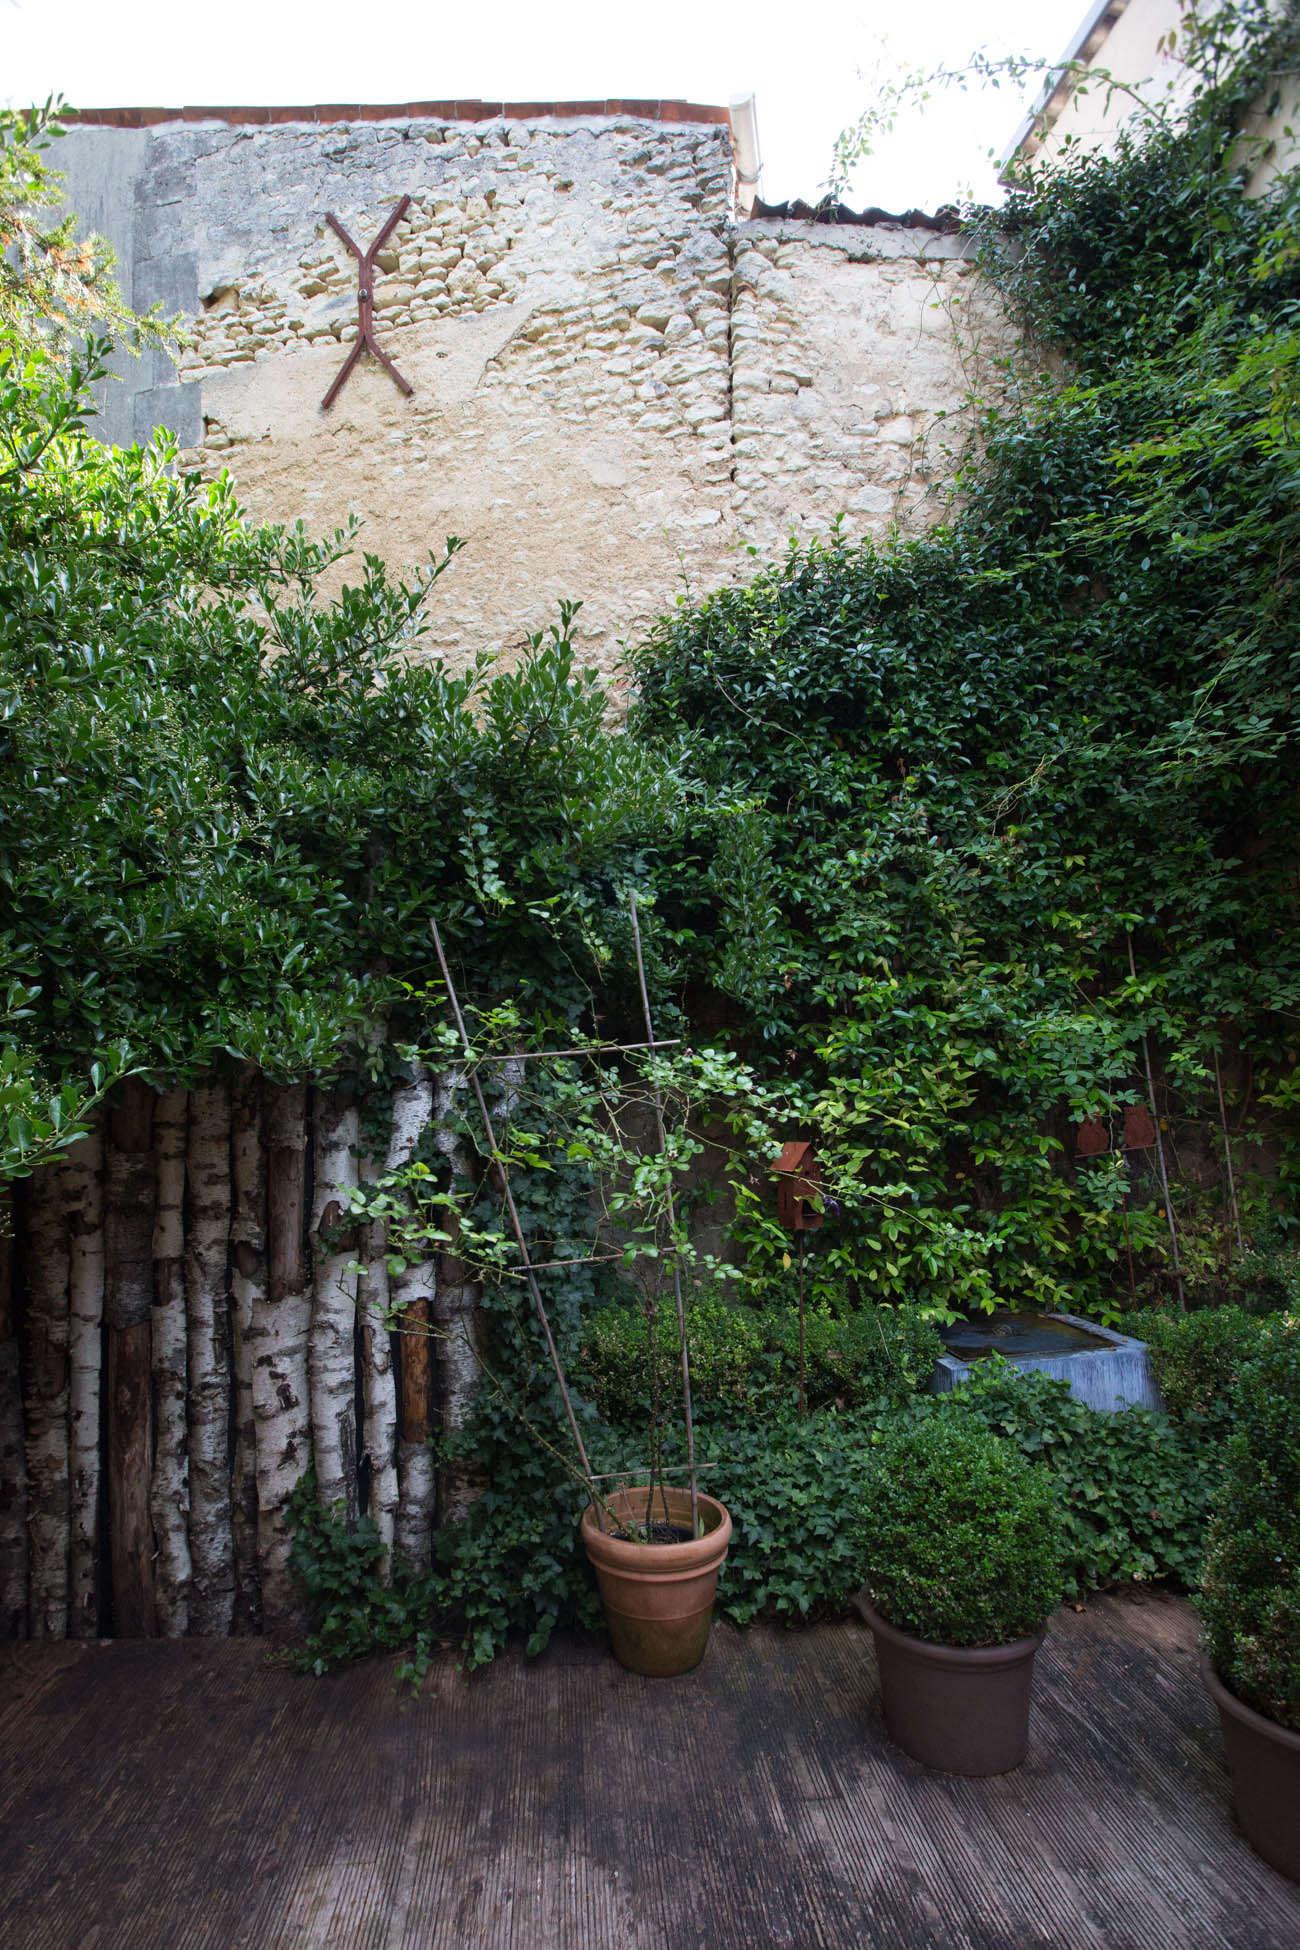 Ambre-store-france-mimi-giboin-gardenista-025